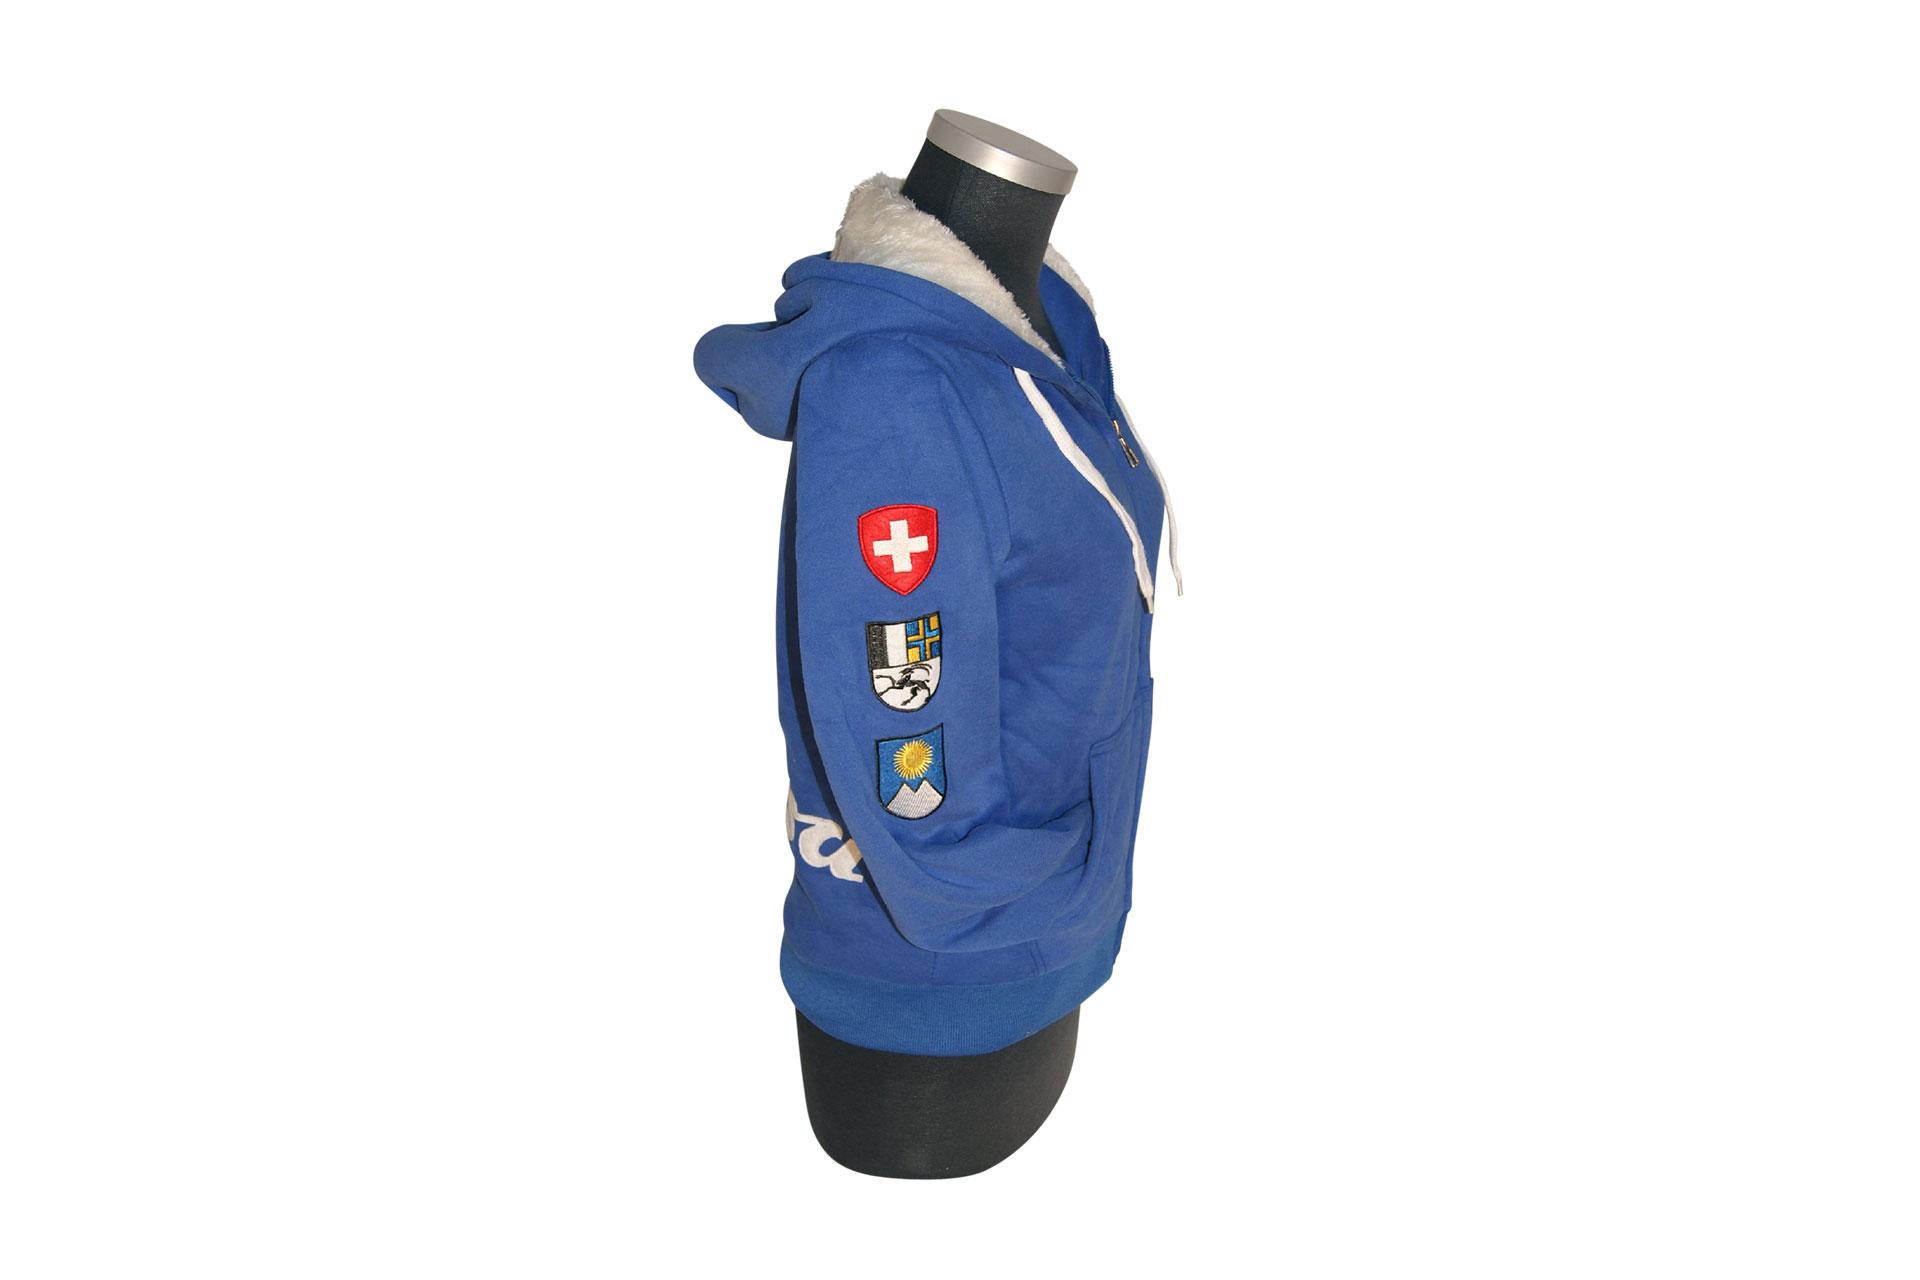 19d91ac8c3ccc7 Arosa Zip Hoody Blau von Souvenir Shop Arosa - Aroser Souvenirs